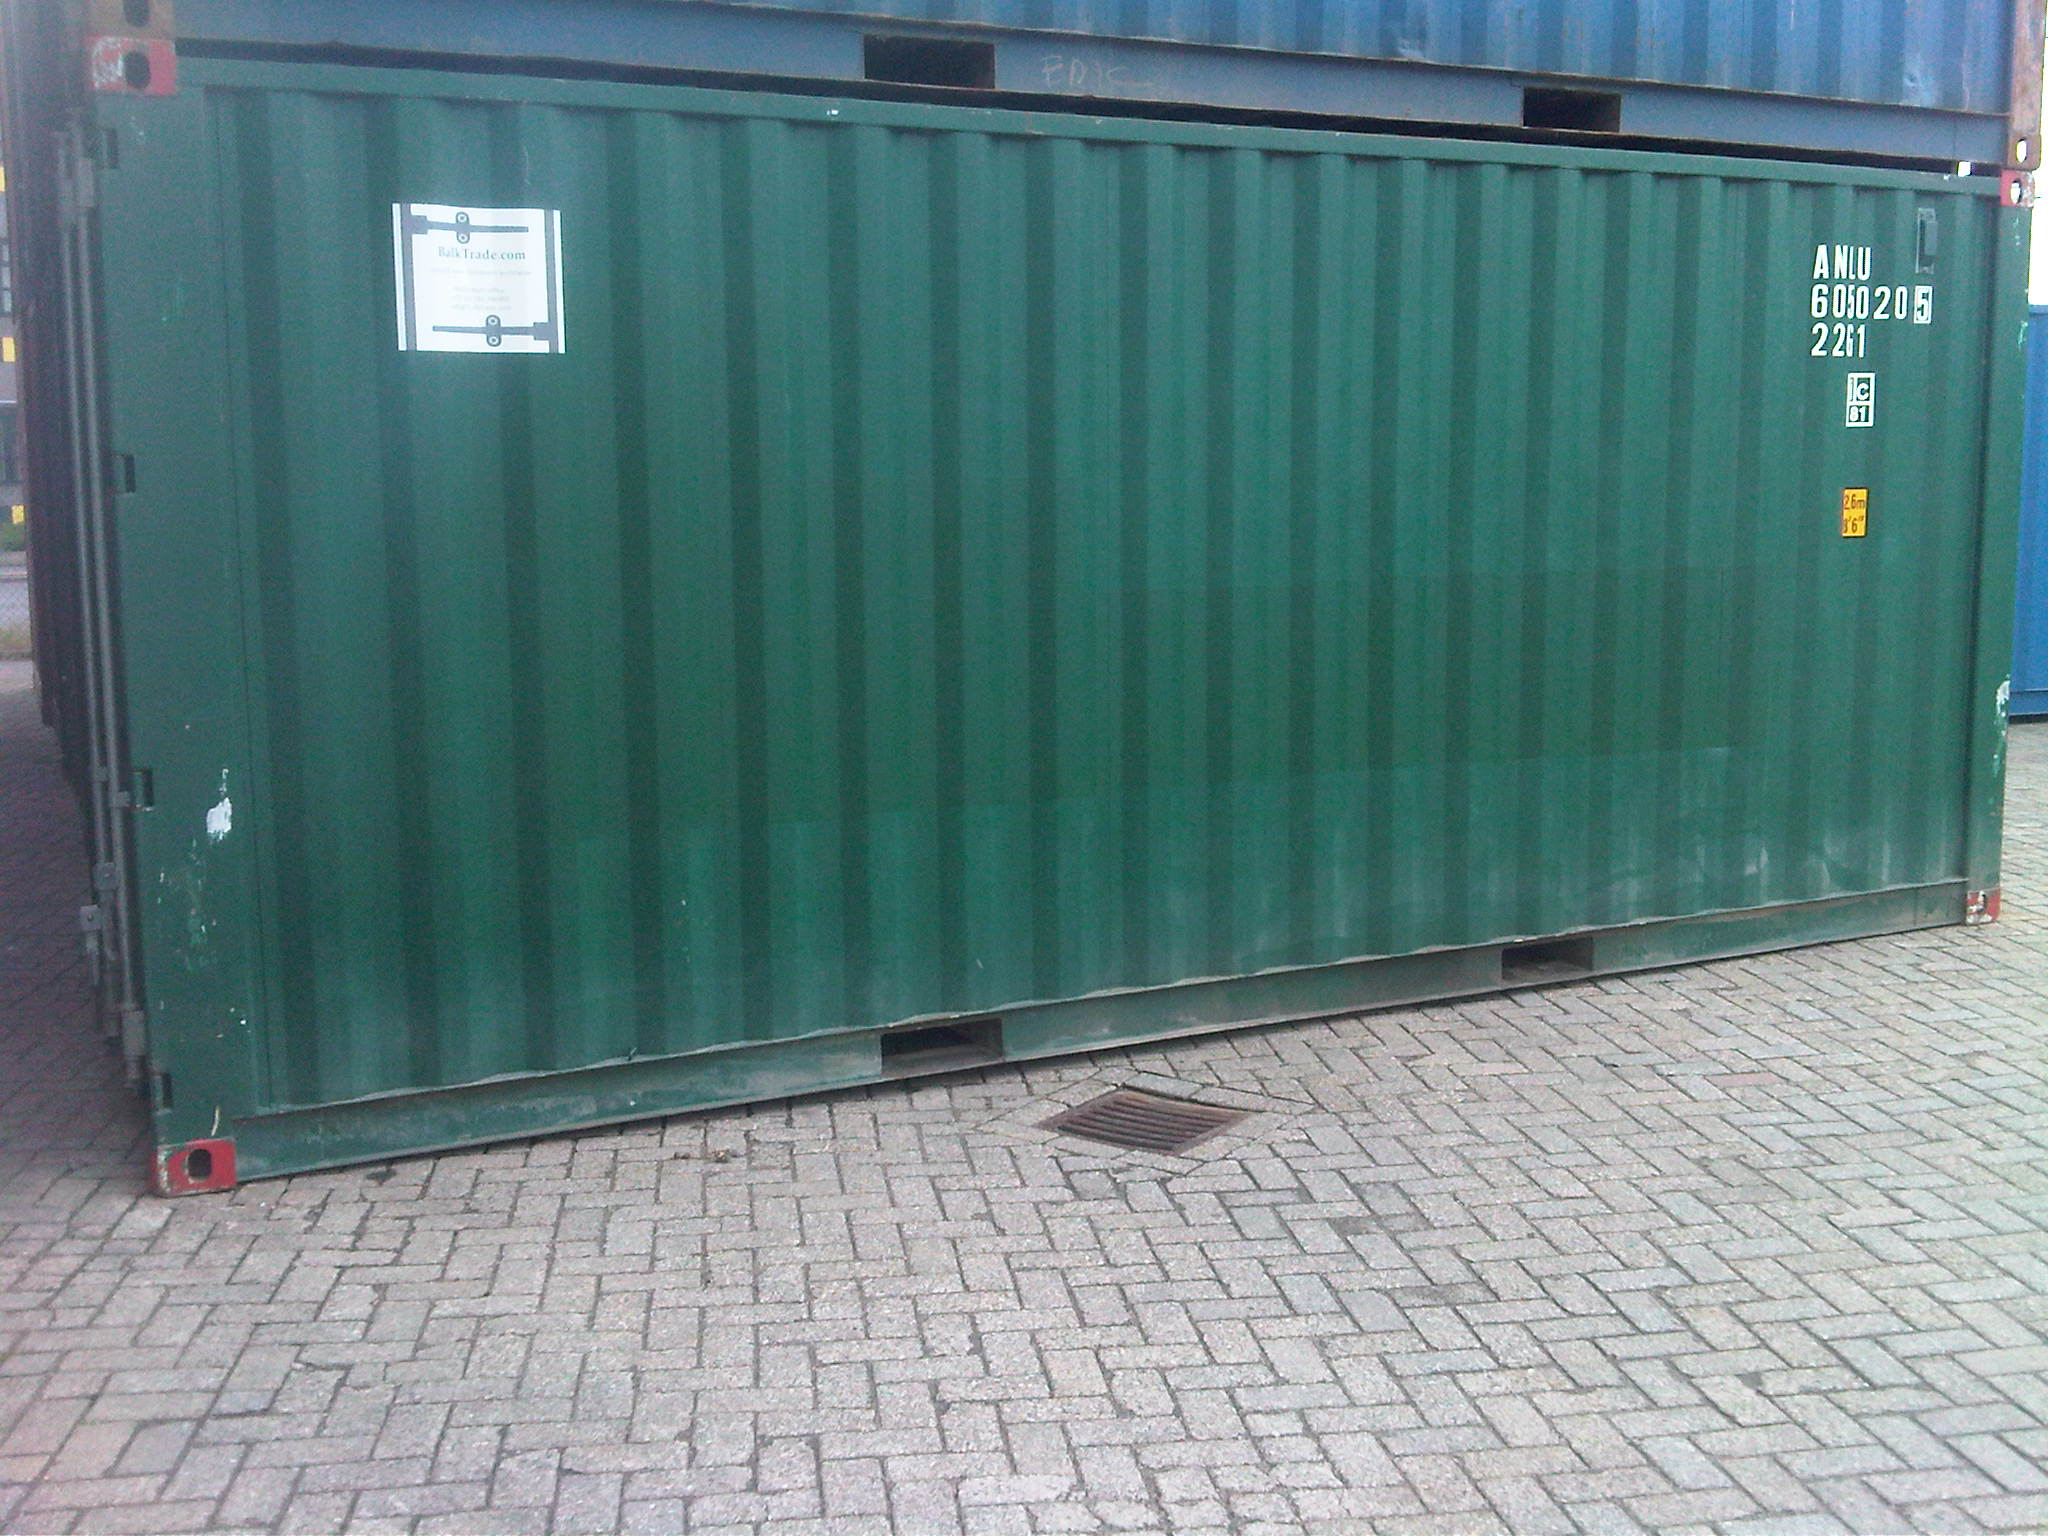 les containers dry sont des containers standard acheter un container. Black Bedroom Furniture Sets. Home Design Ideas